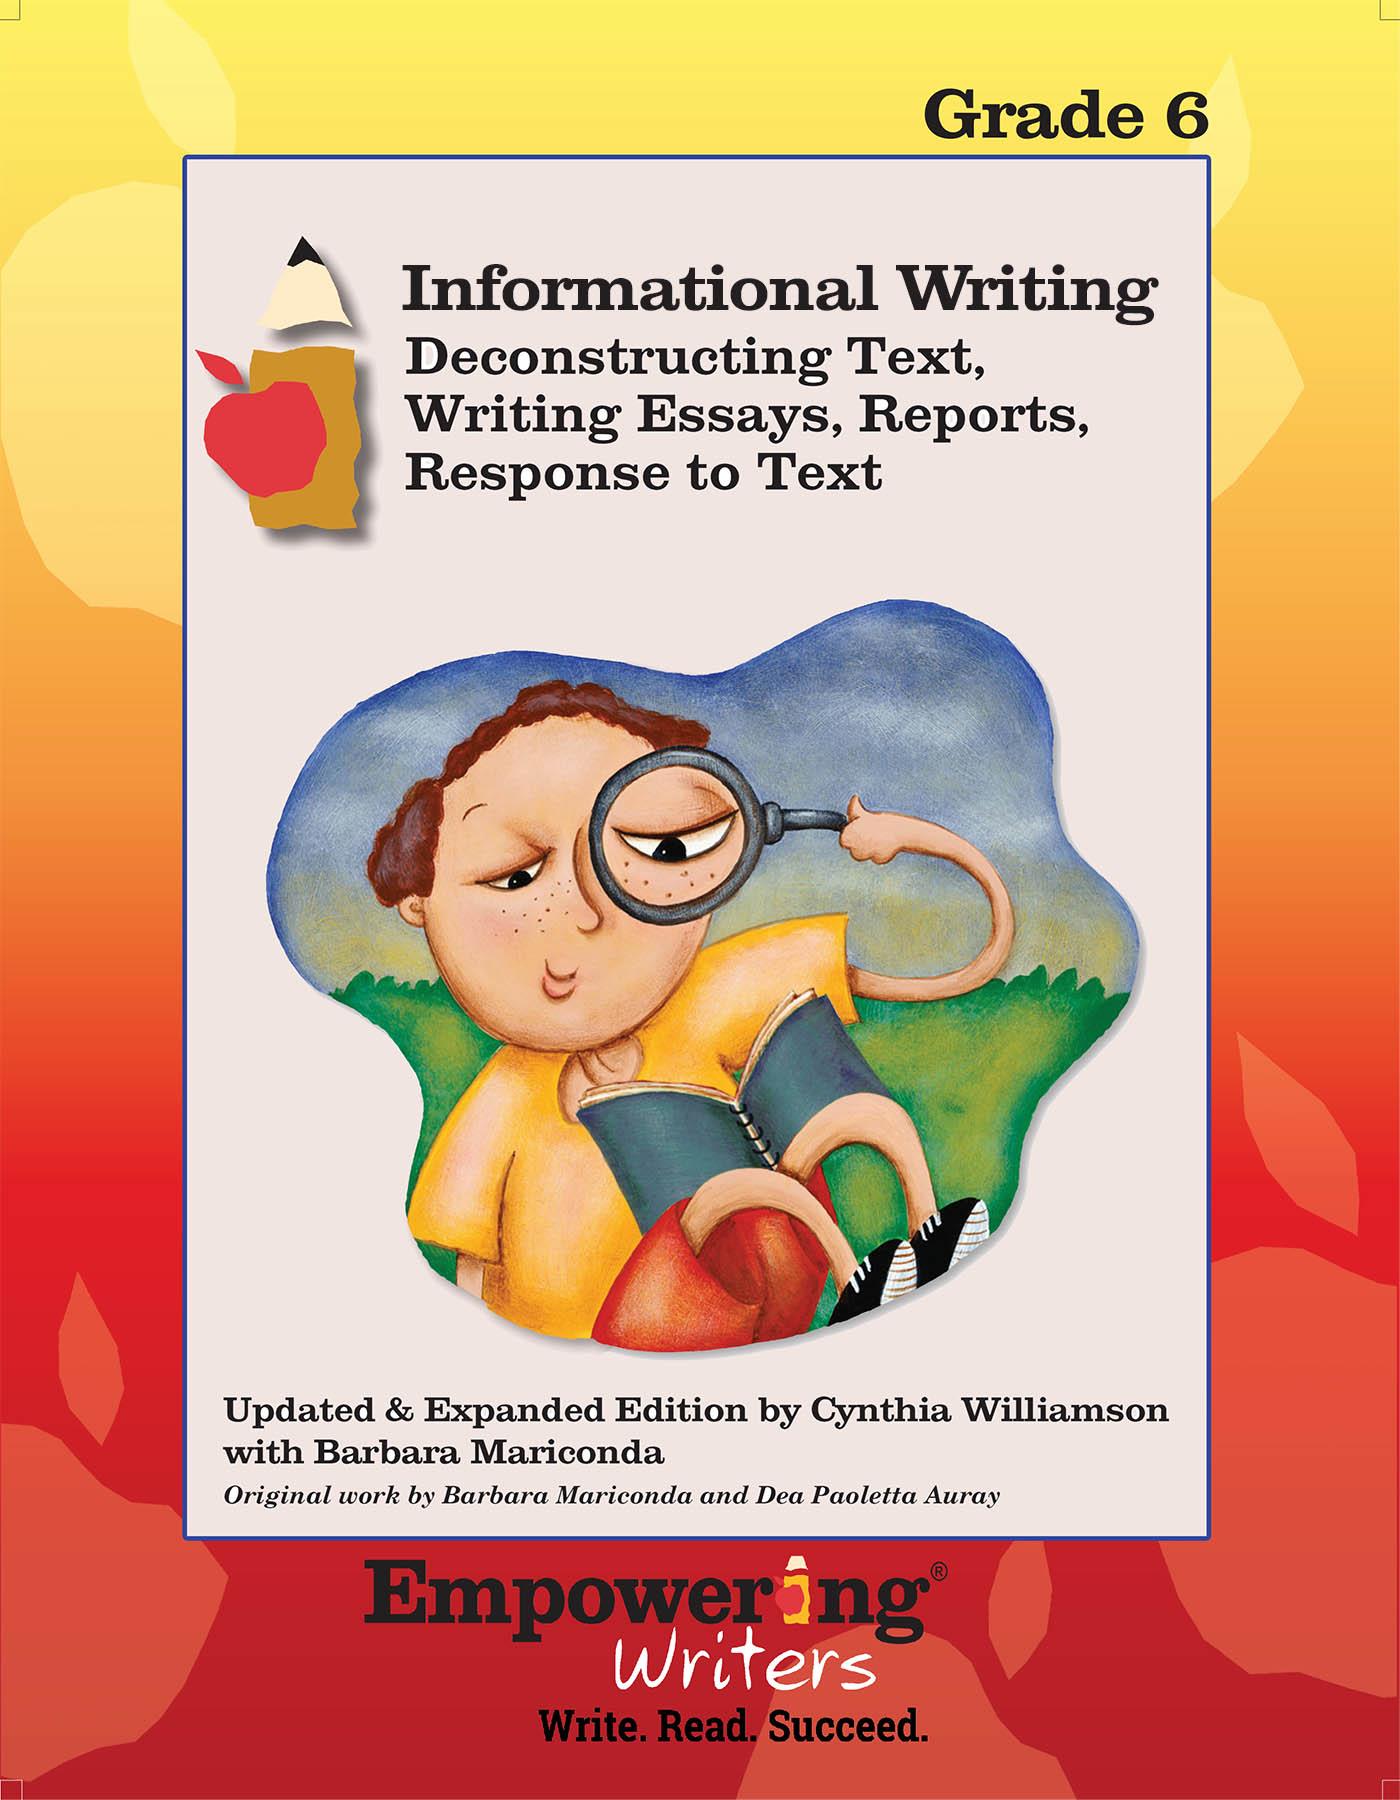 Grade 6 Informational Guide Cover 1.03.19-1